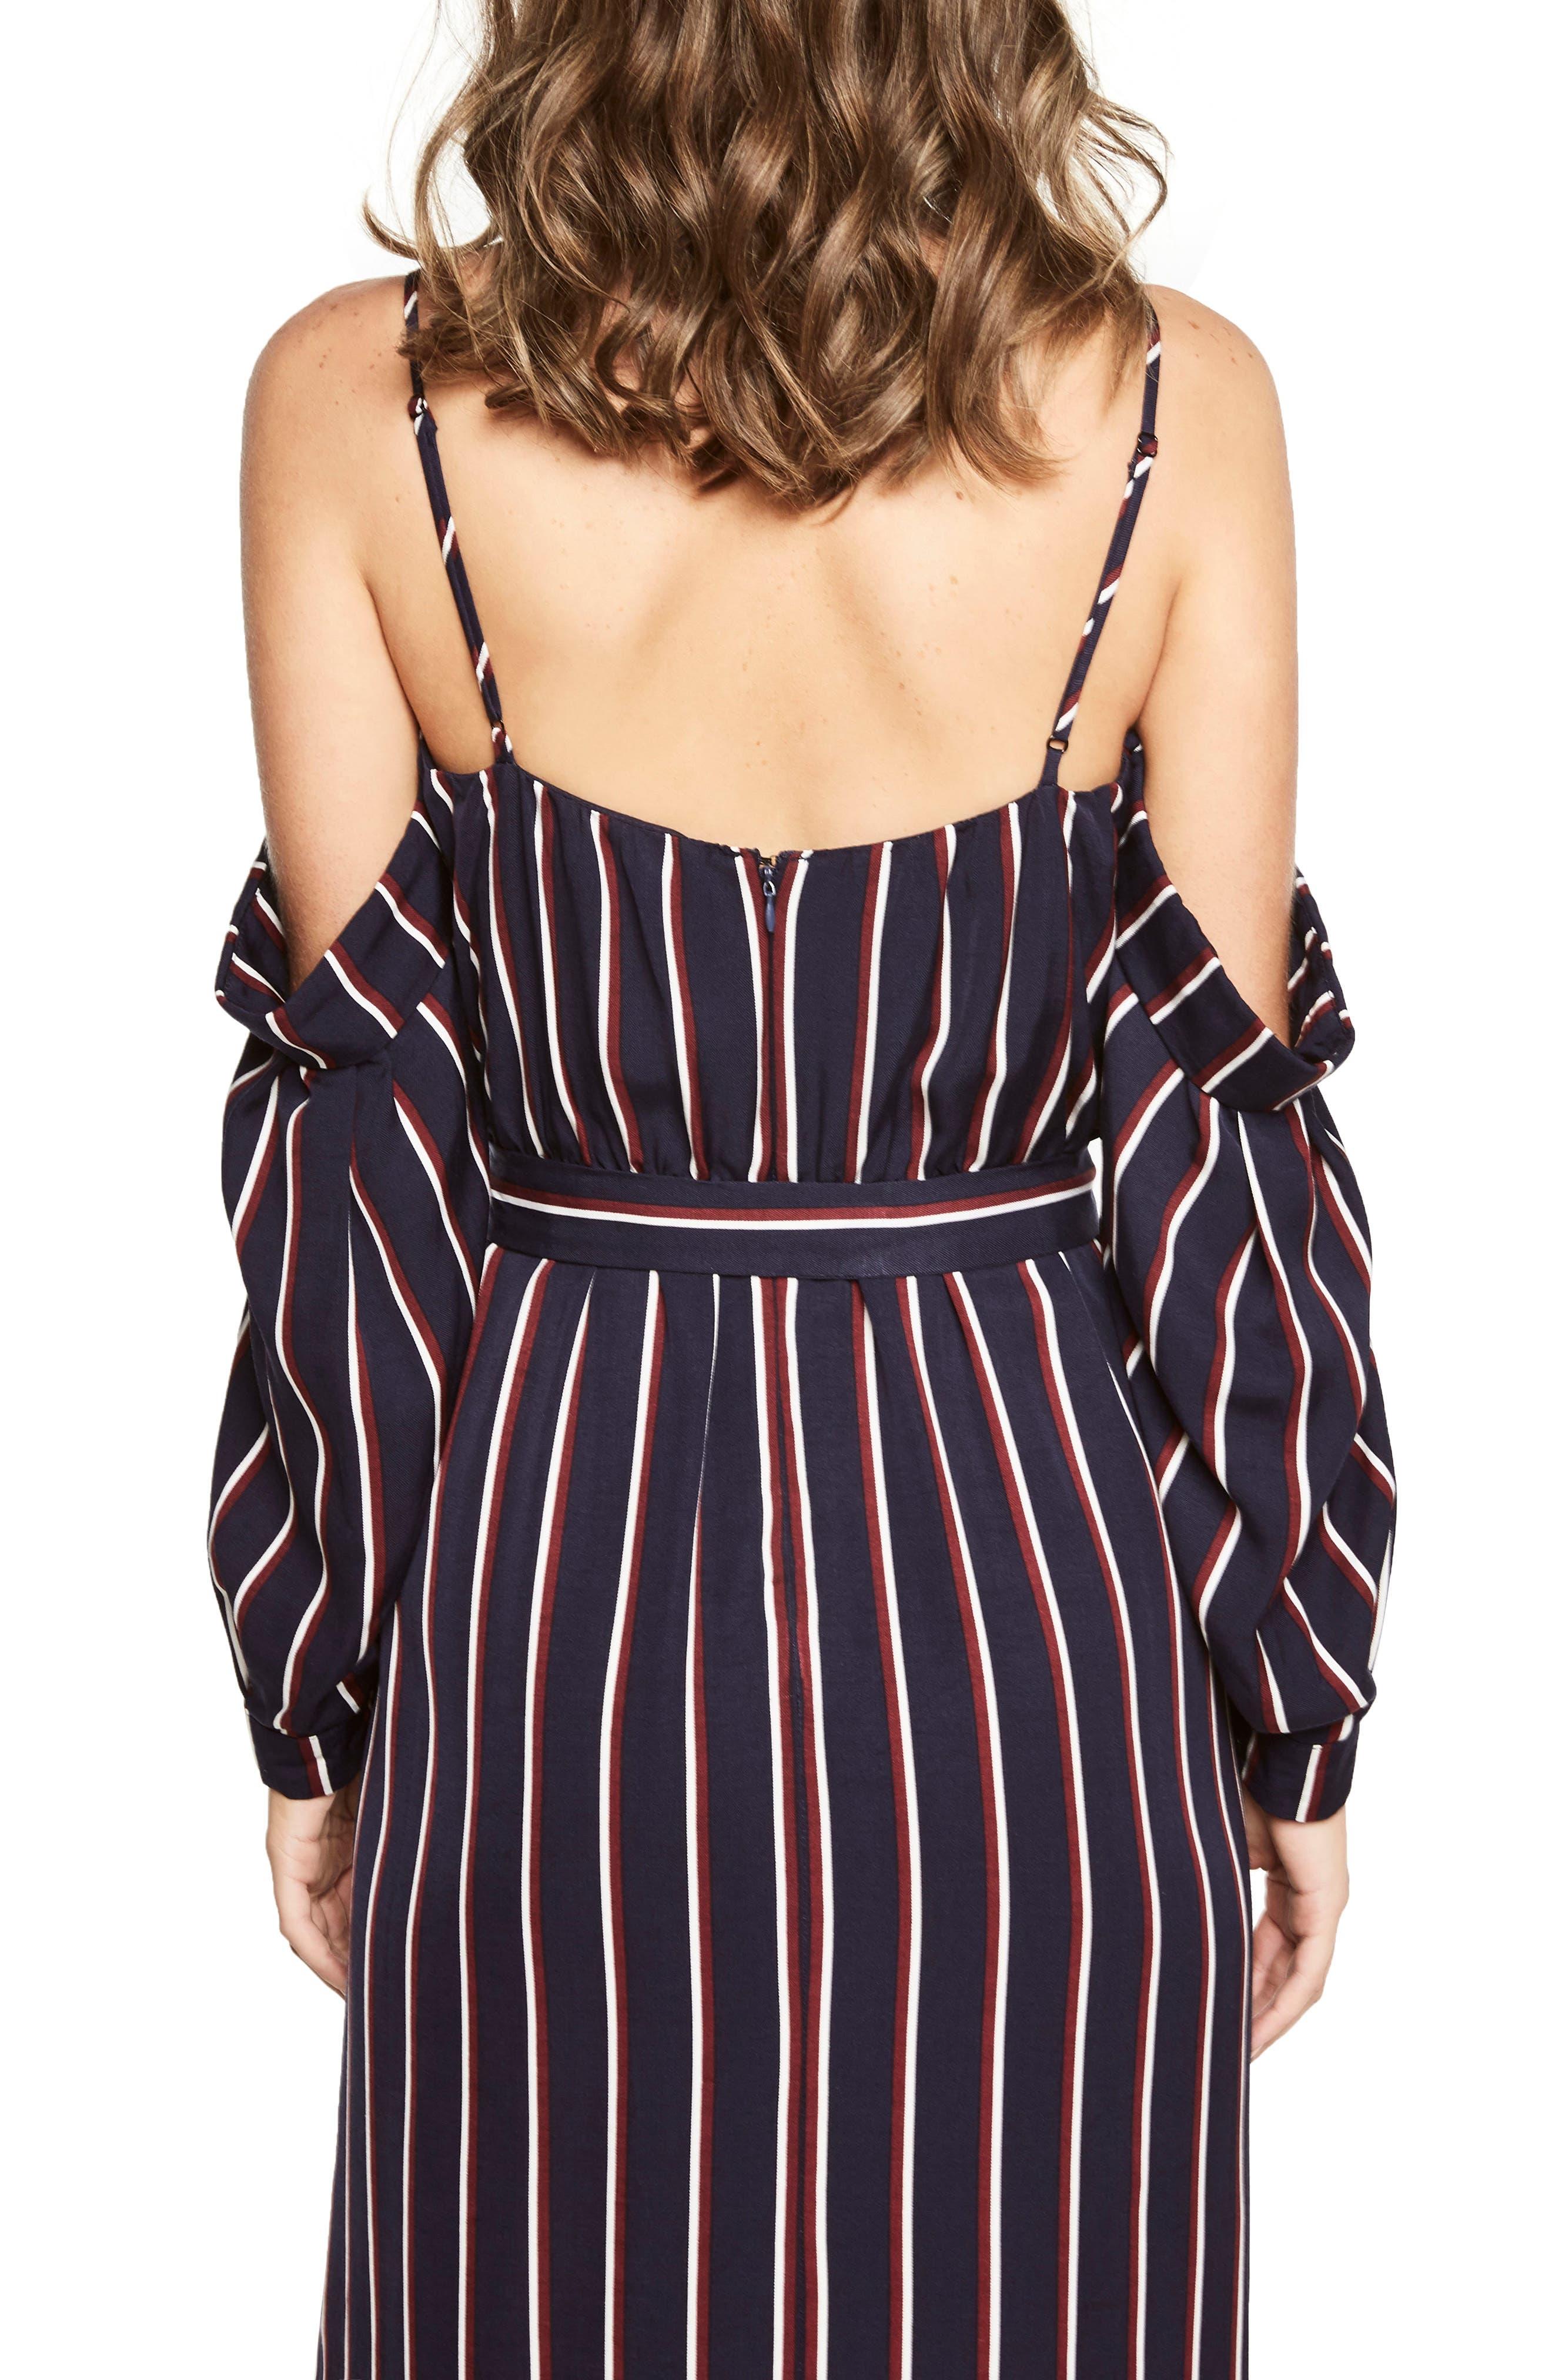 Paloma Off the Shoulder Dress,                             Alternate thumbnail 2, color,                             Navy Stripe